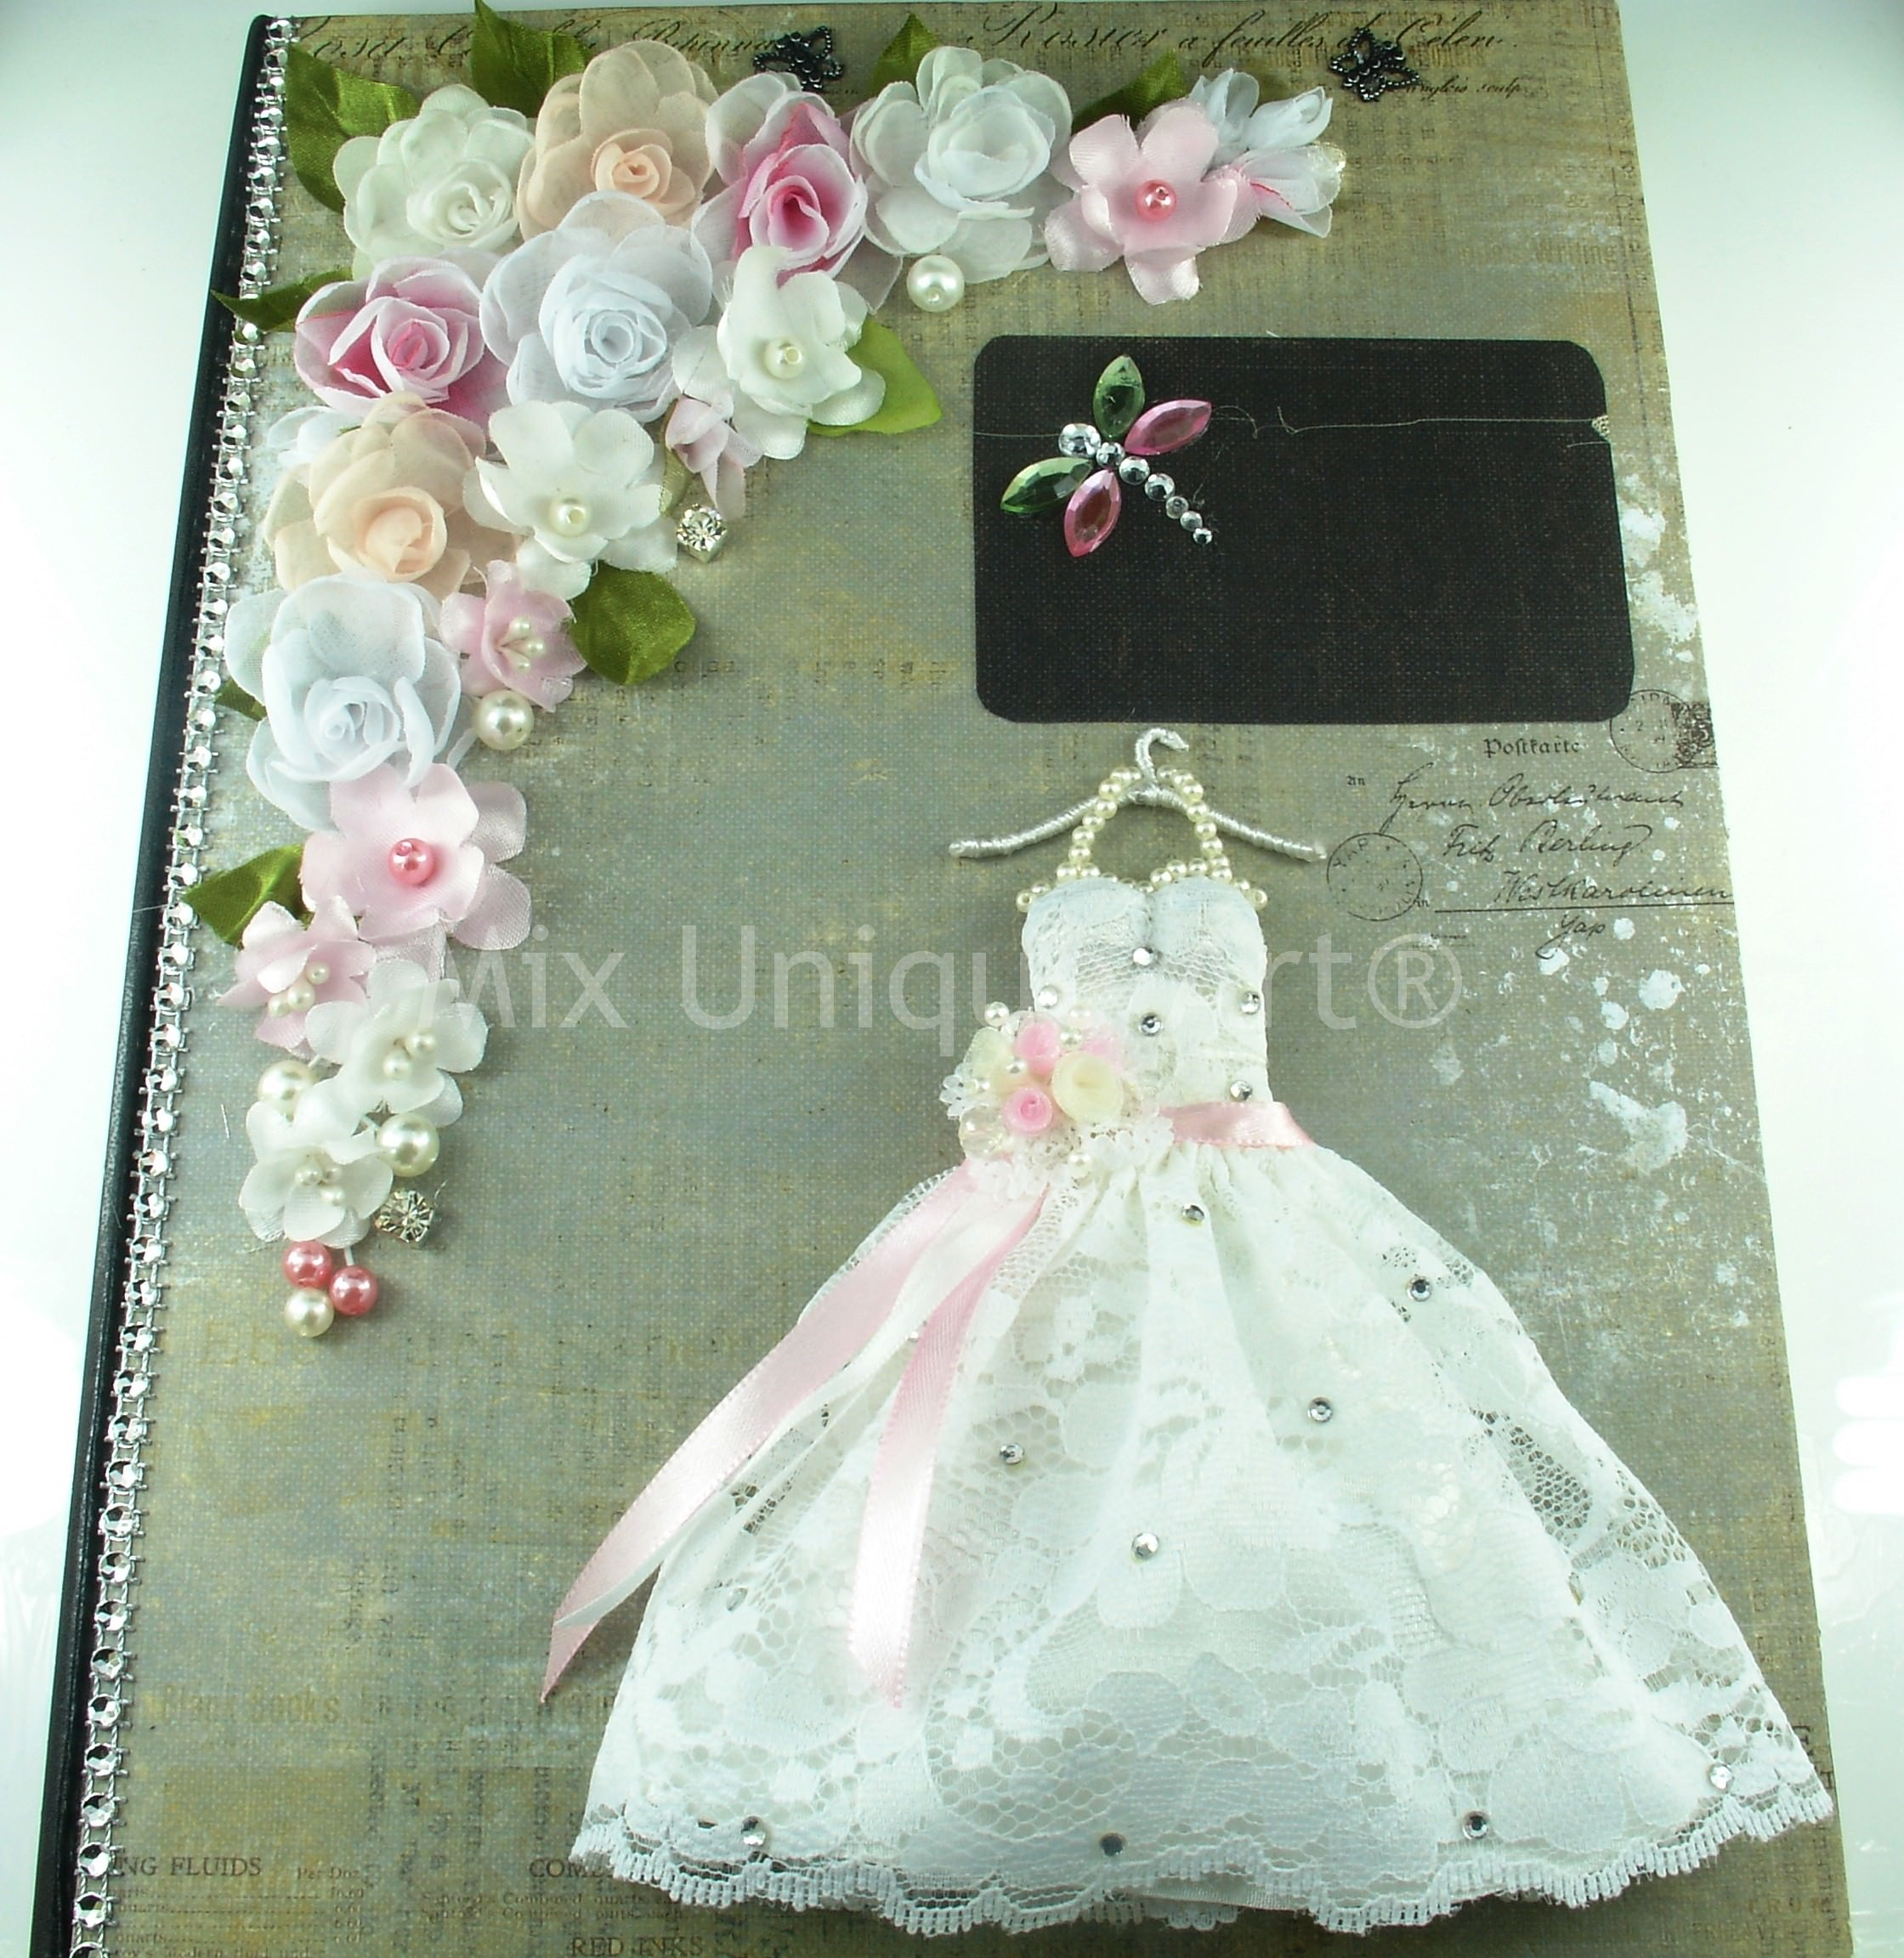 Wedding Guest Book By Mixua